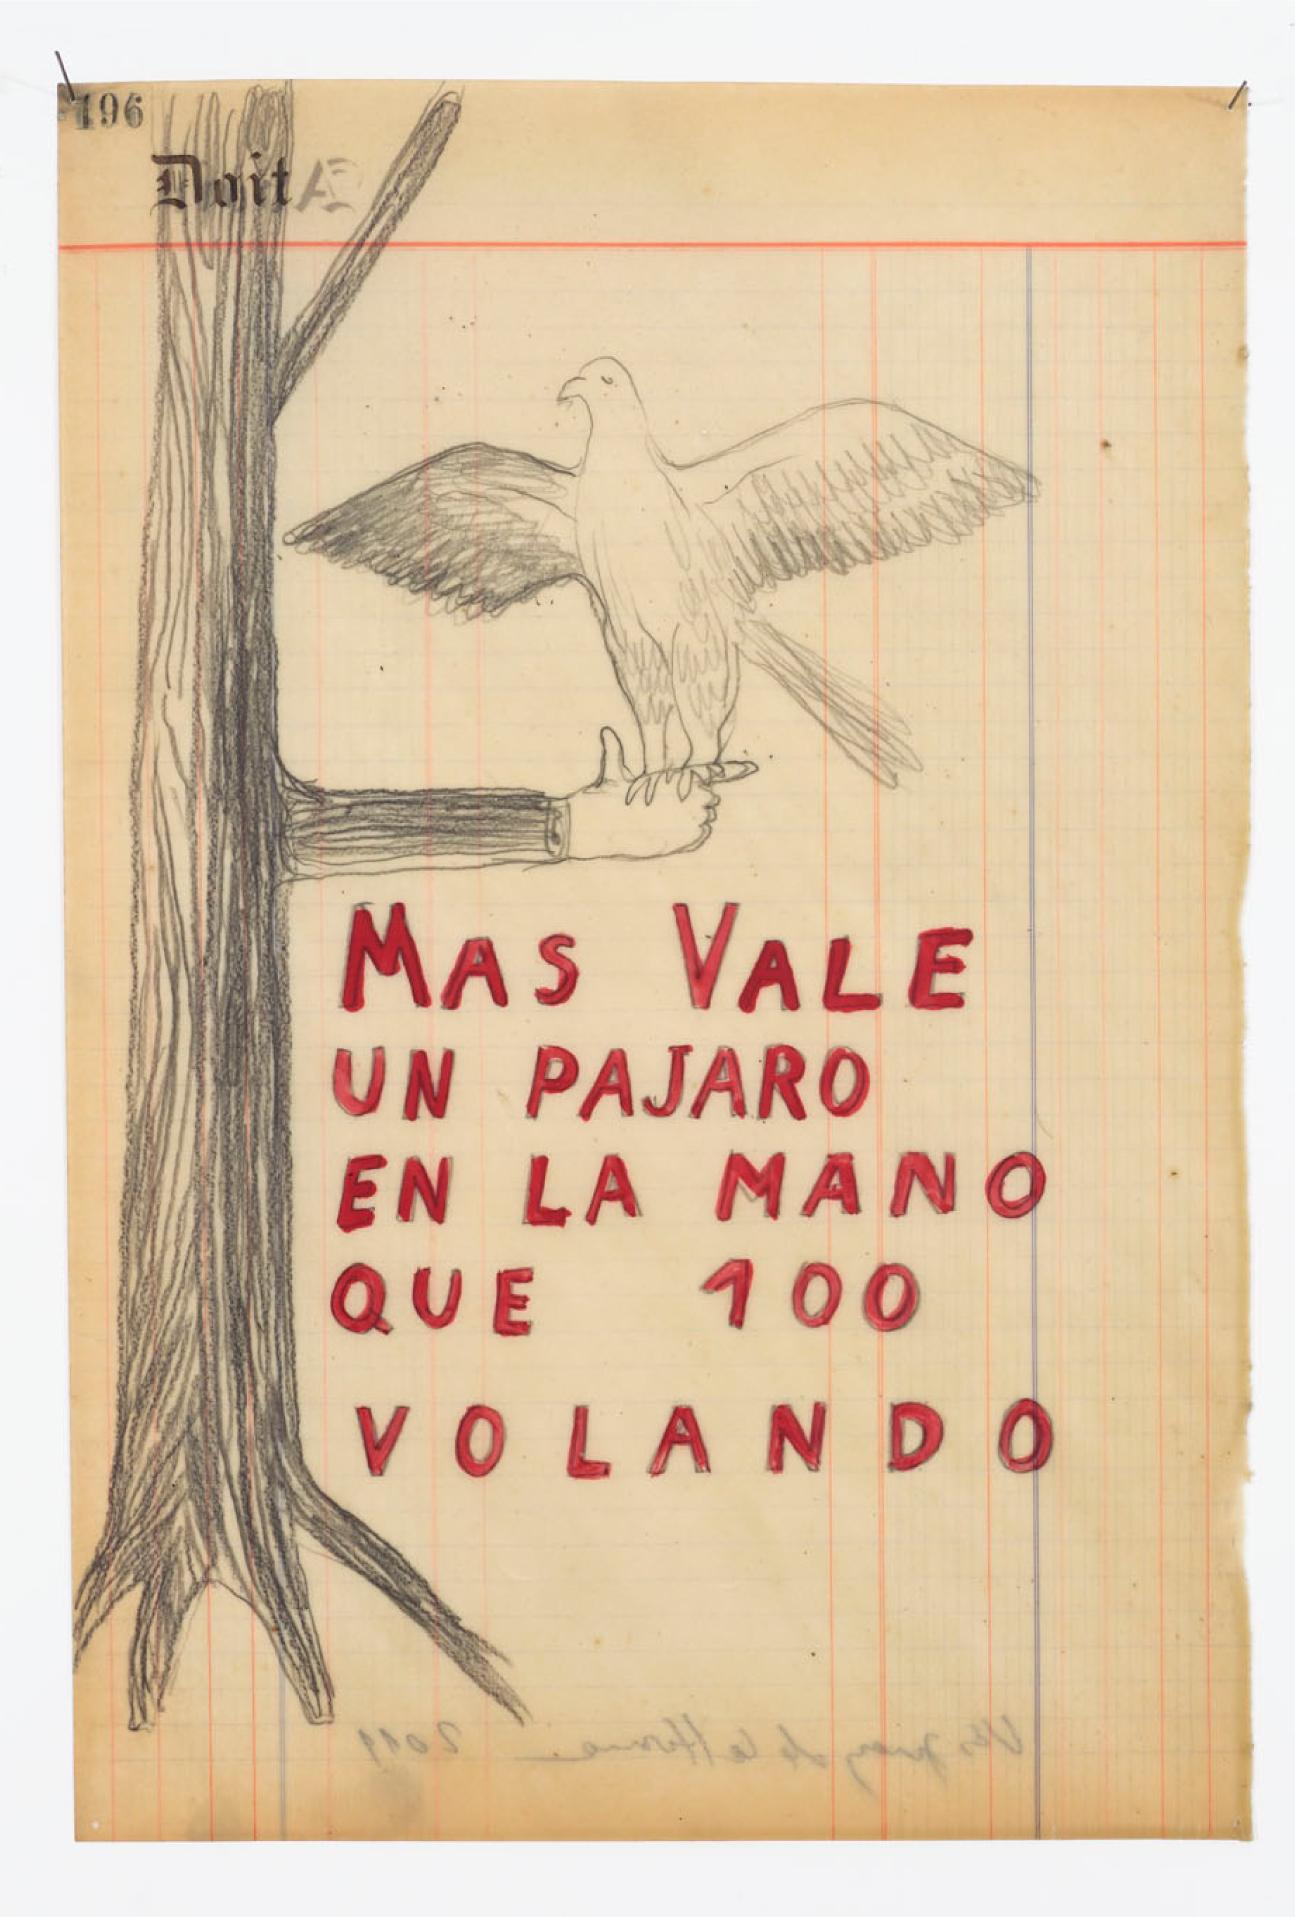 Sandra Vasquez De La Horra, Mas vale un pajaro en el mano que 100 (More valuable is a bird in the hand than 100 flying), 2011, Wax and graphite on ledger paper, 15 3/8h x 10 1/4w in